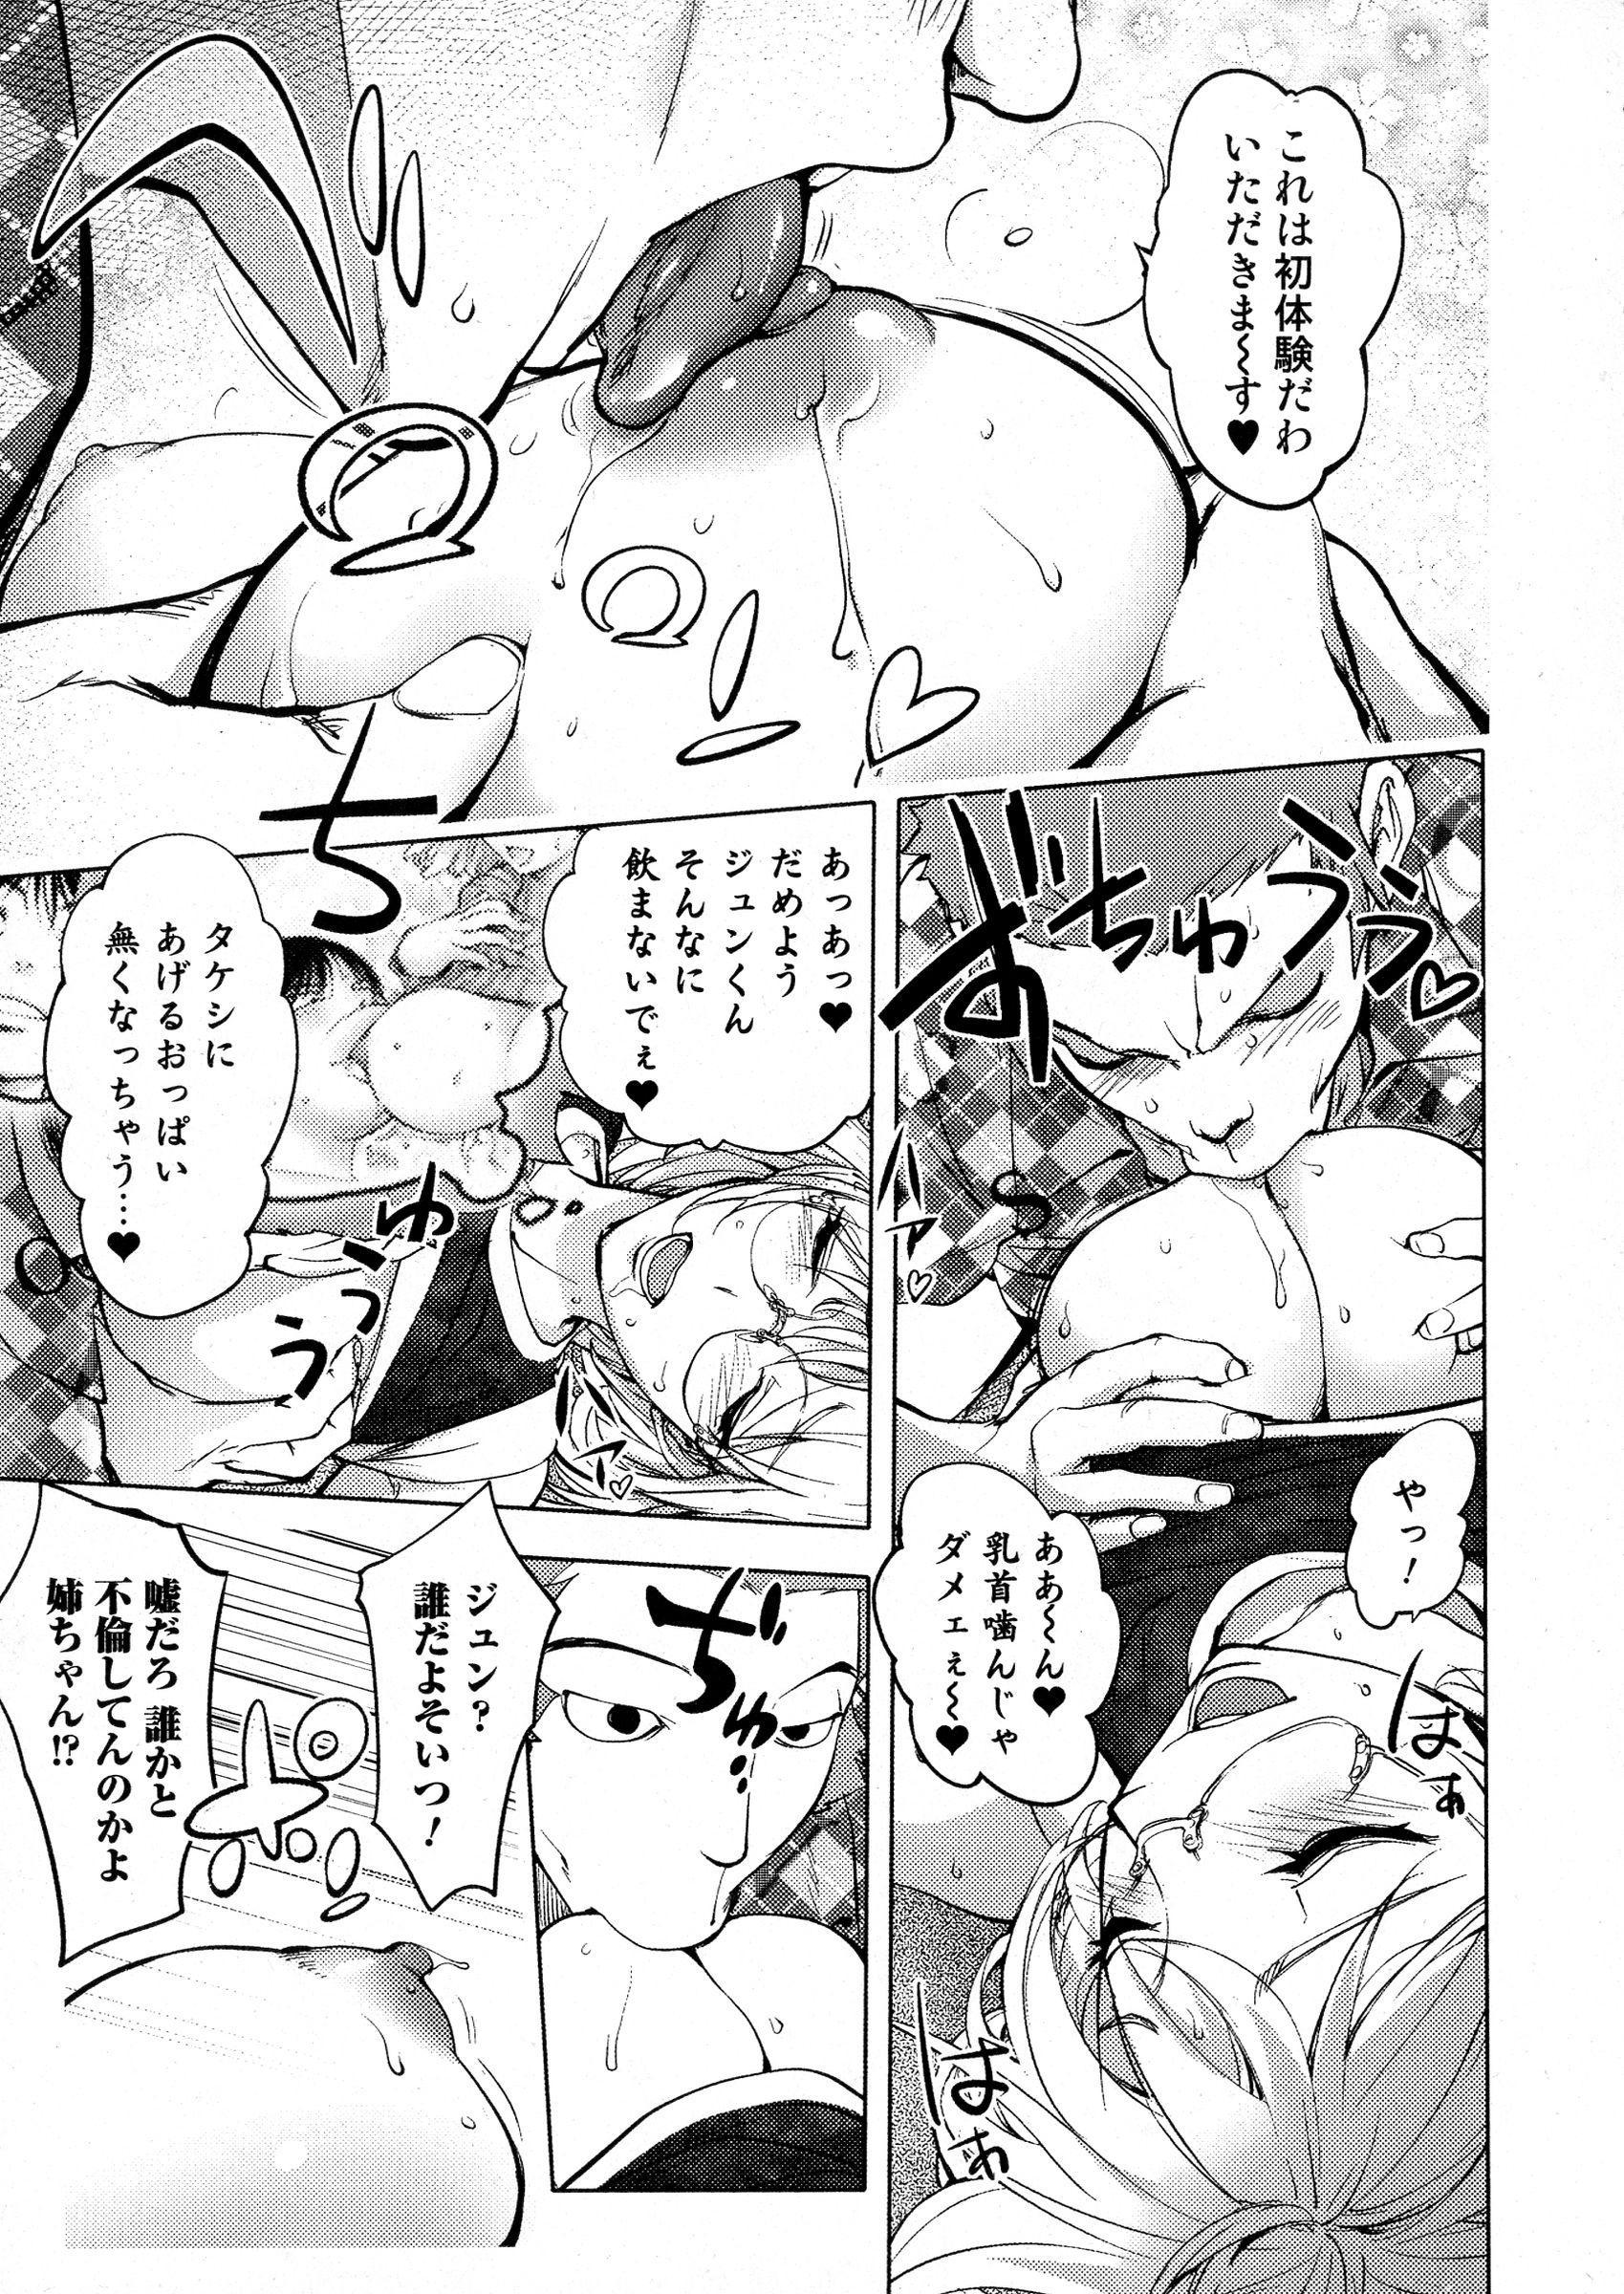 COMIC JSCK Vol. 5 110